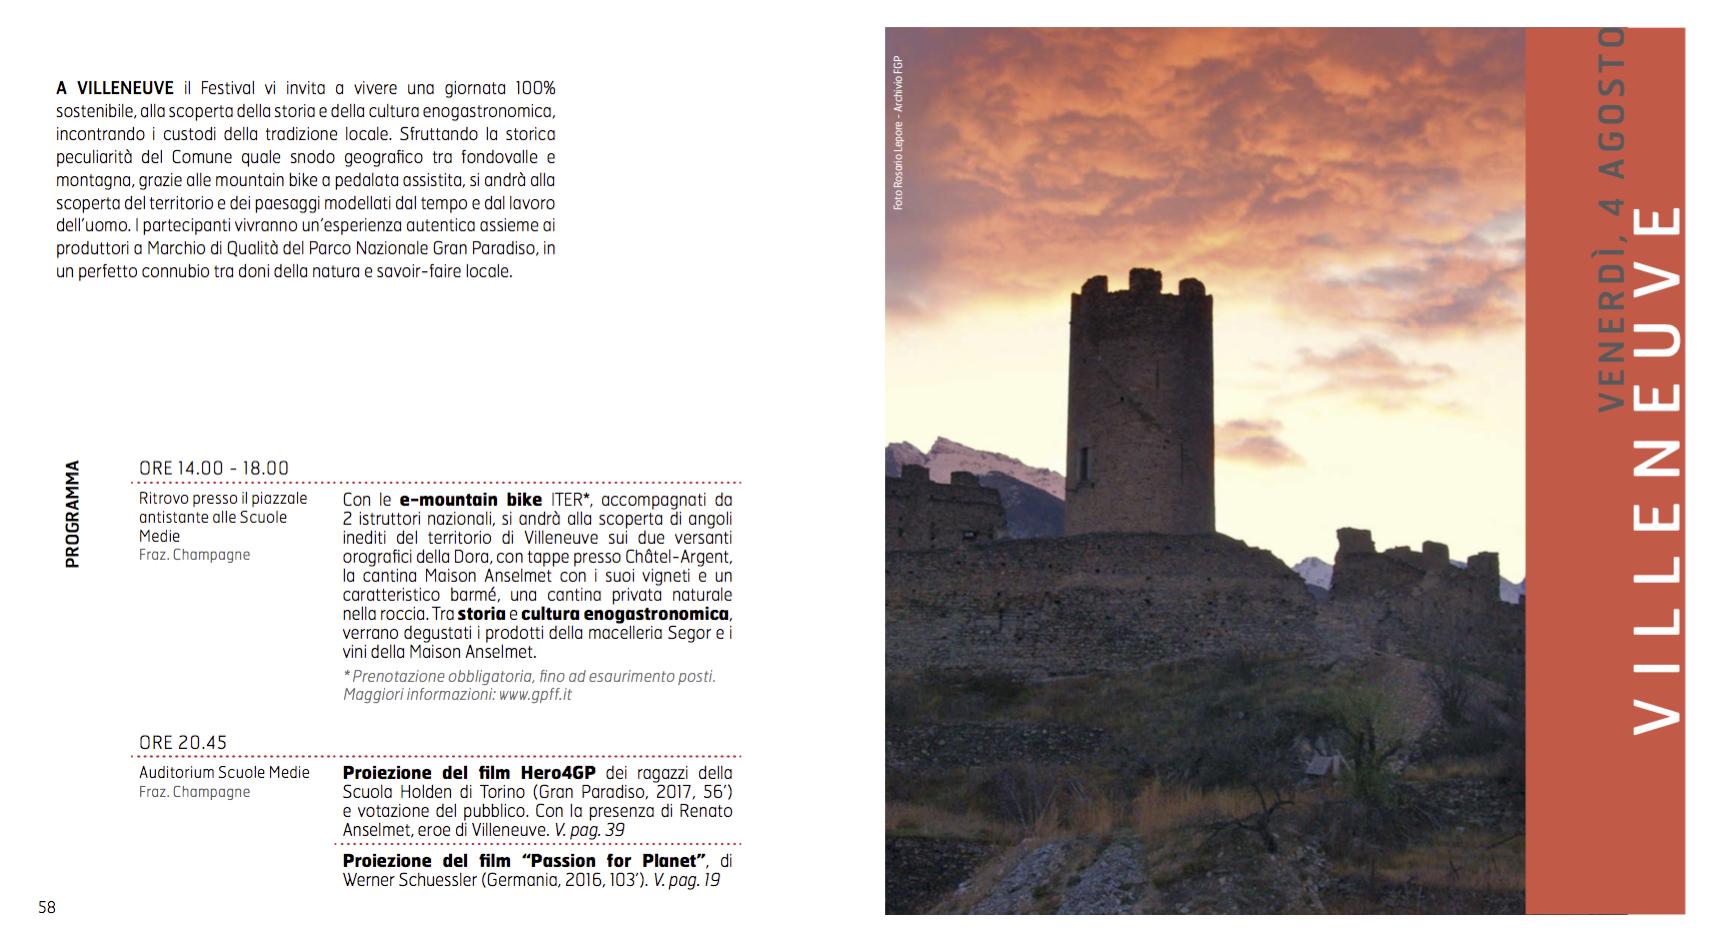 Programma Villeneuve GPFF - edizione 20